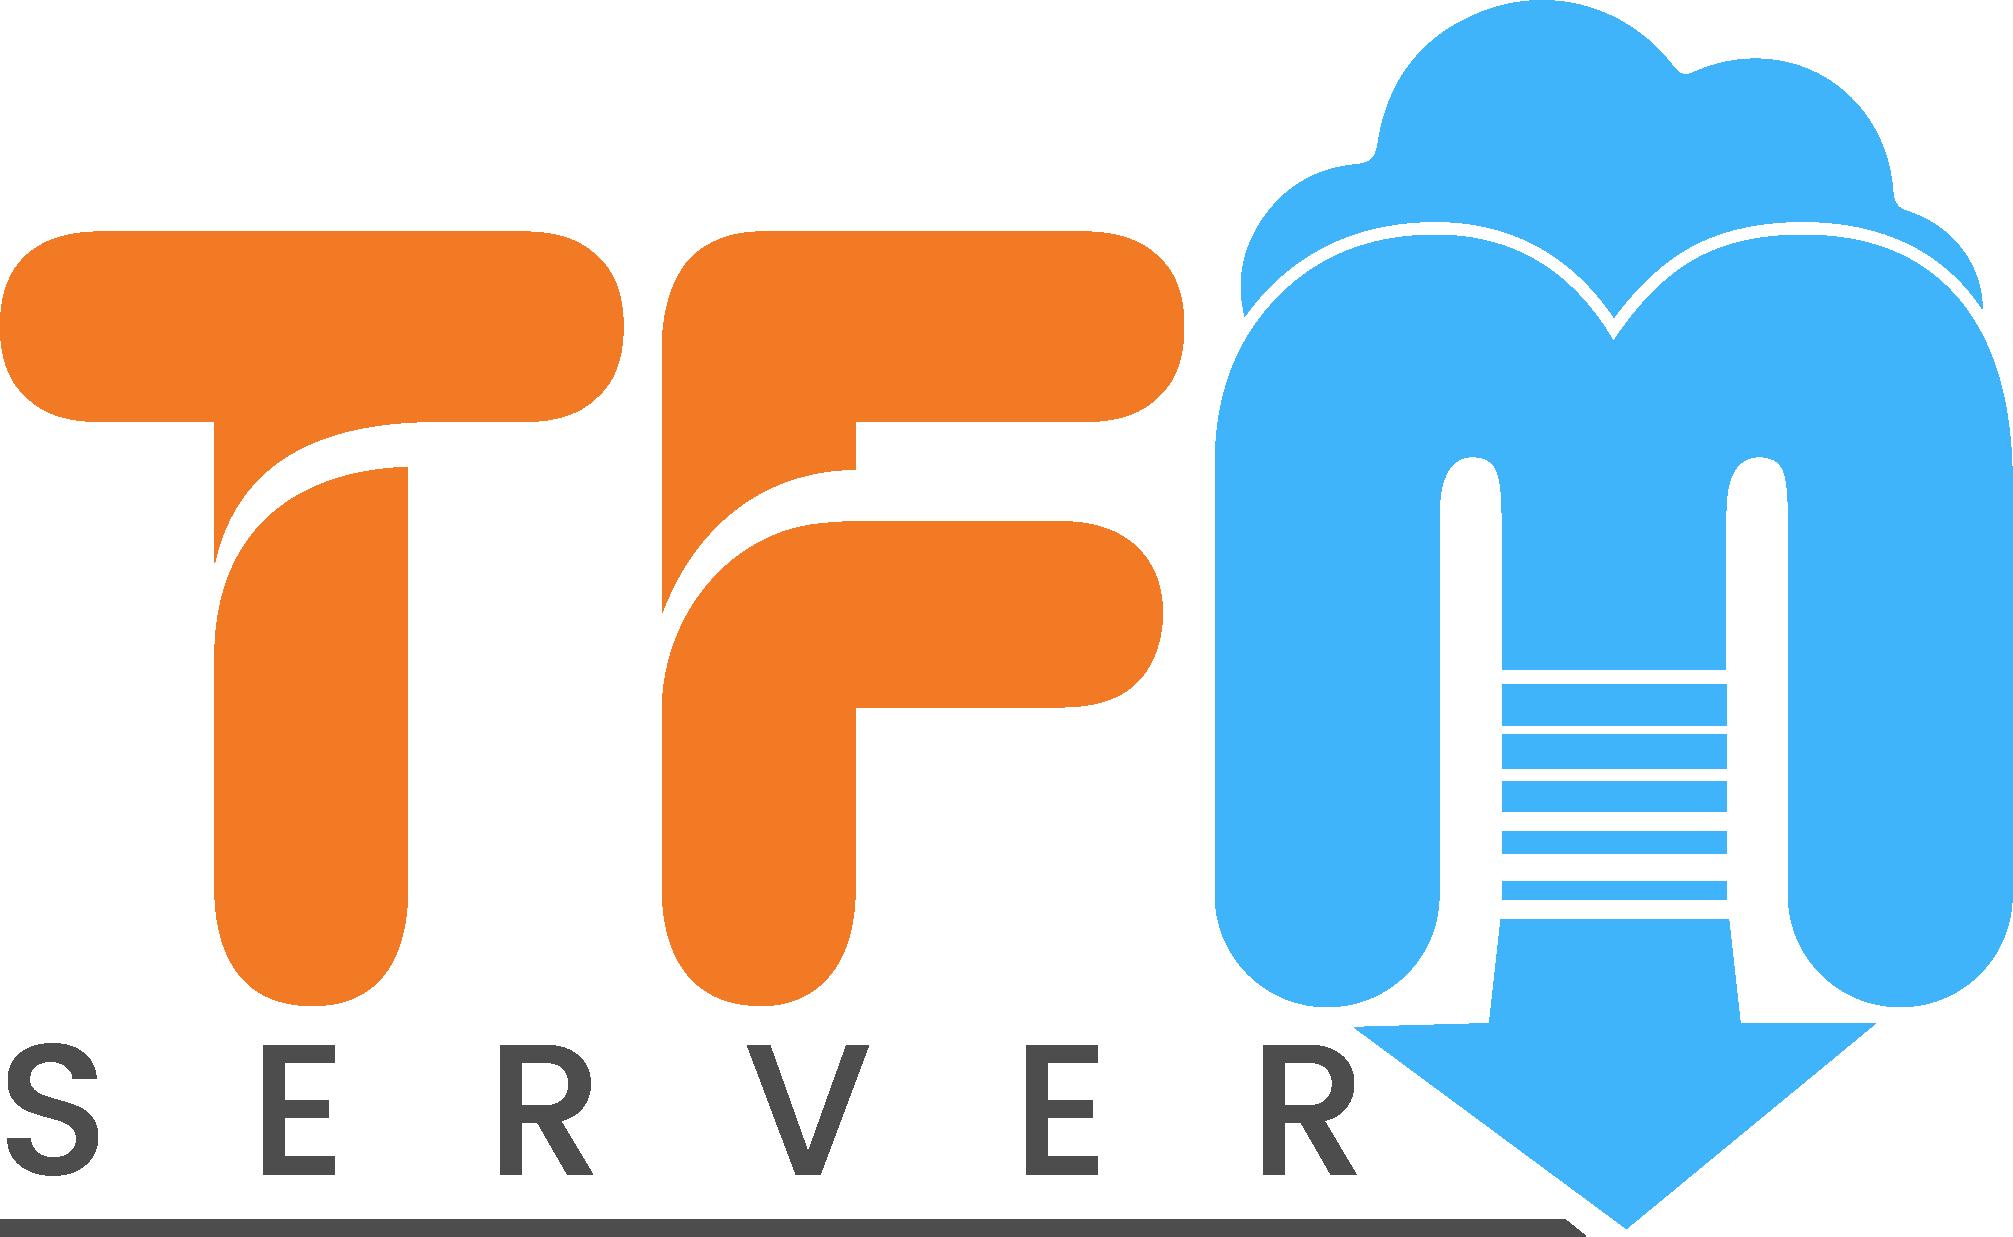 TFM Server